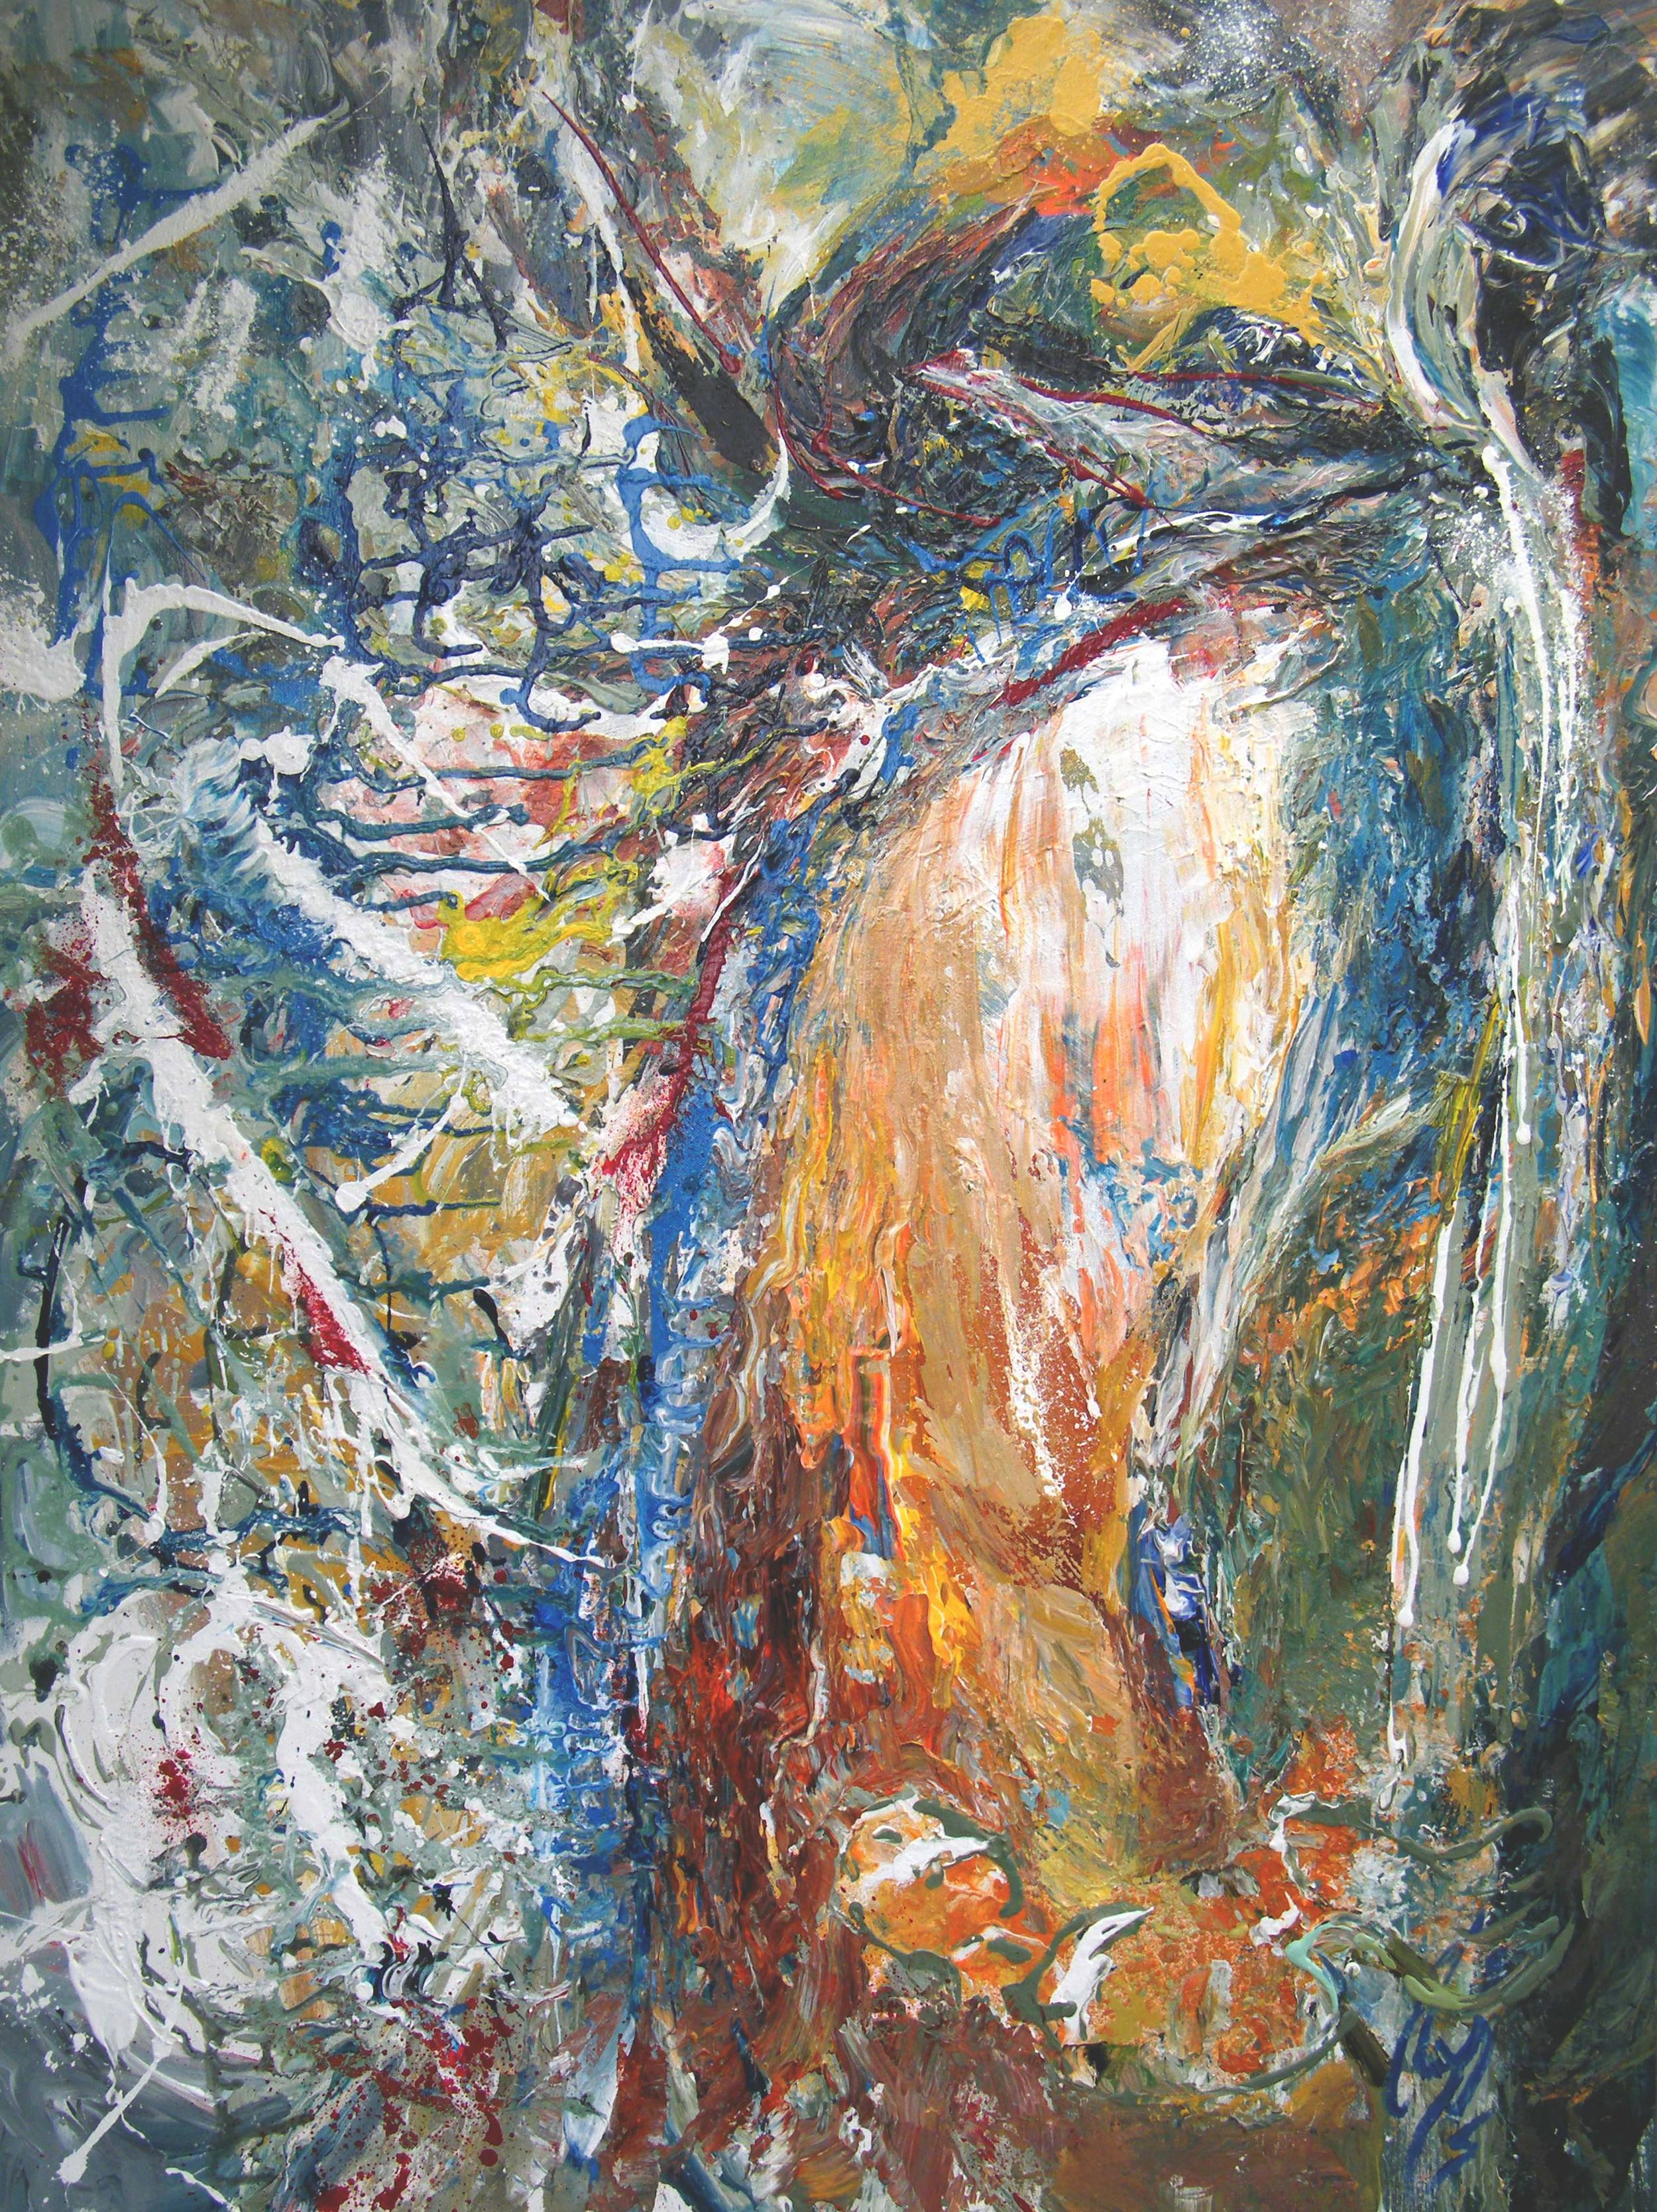 The Thinker - 48 x 36, Acrylic on Canvas.